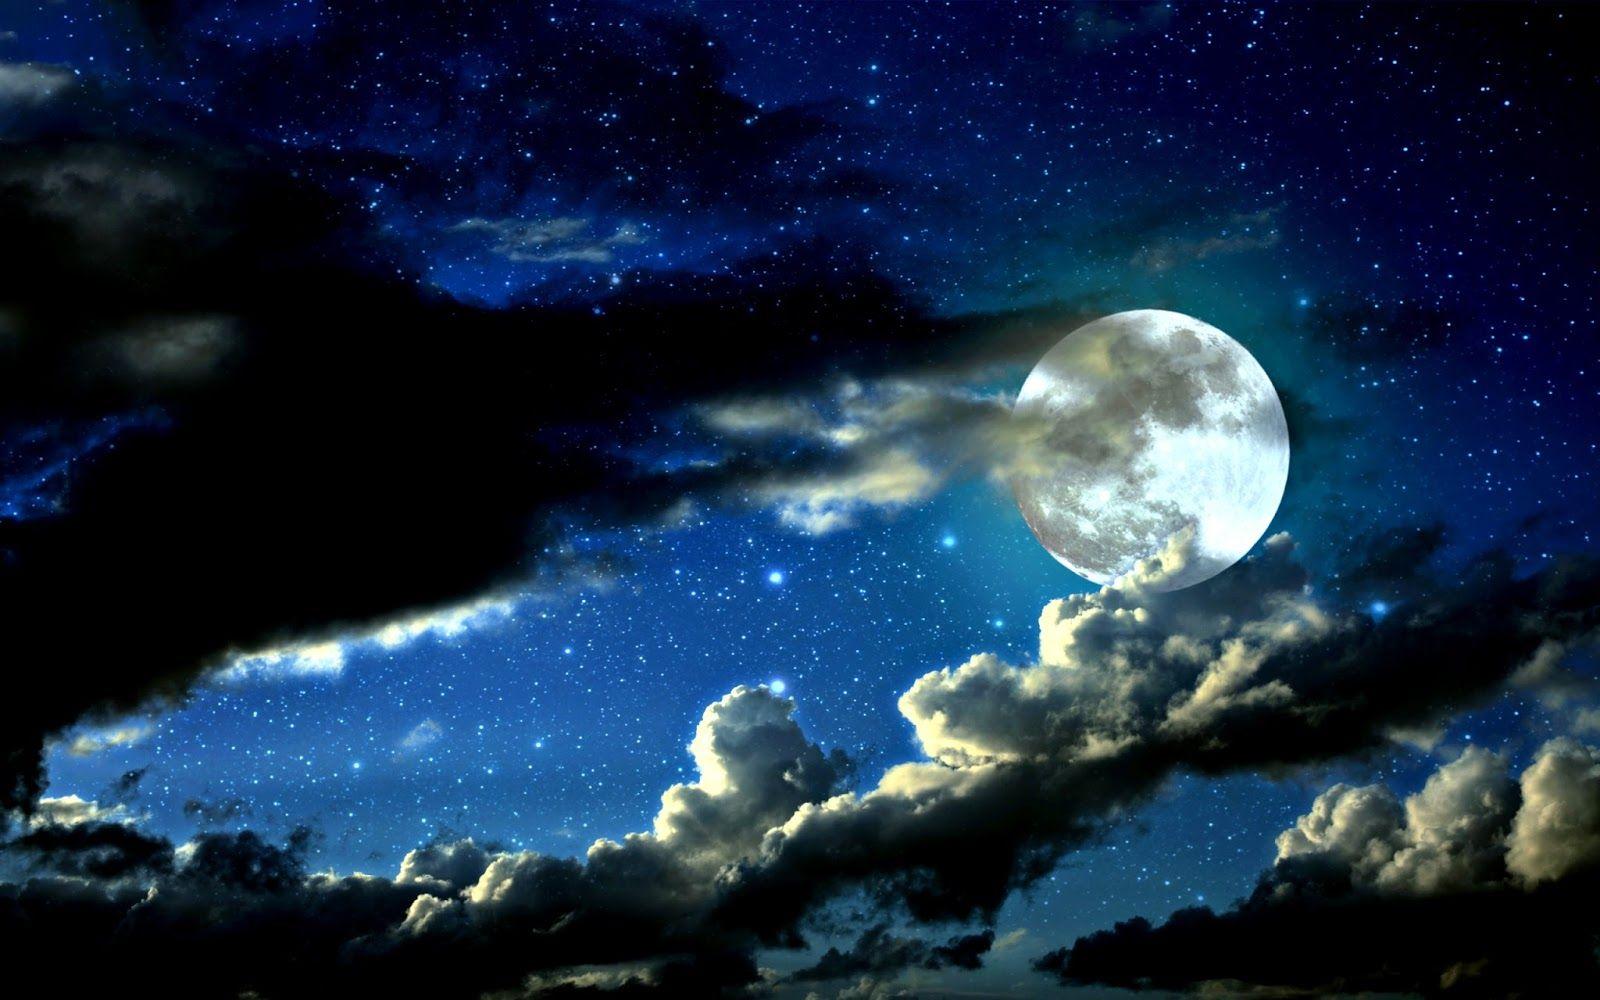 Full moon... #moon #fullmoon #luna #sky #flymetothemoon .. See more... https://www.facebook.com/chris.wysocki1/media_set?set=a.702782546417147.100000562257390&type=3